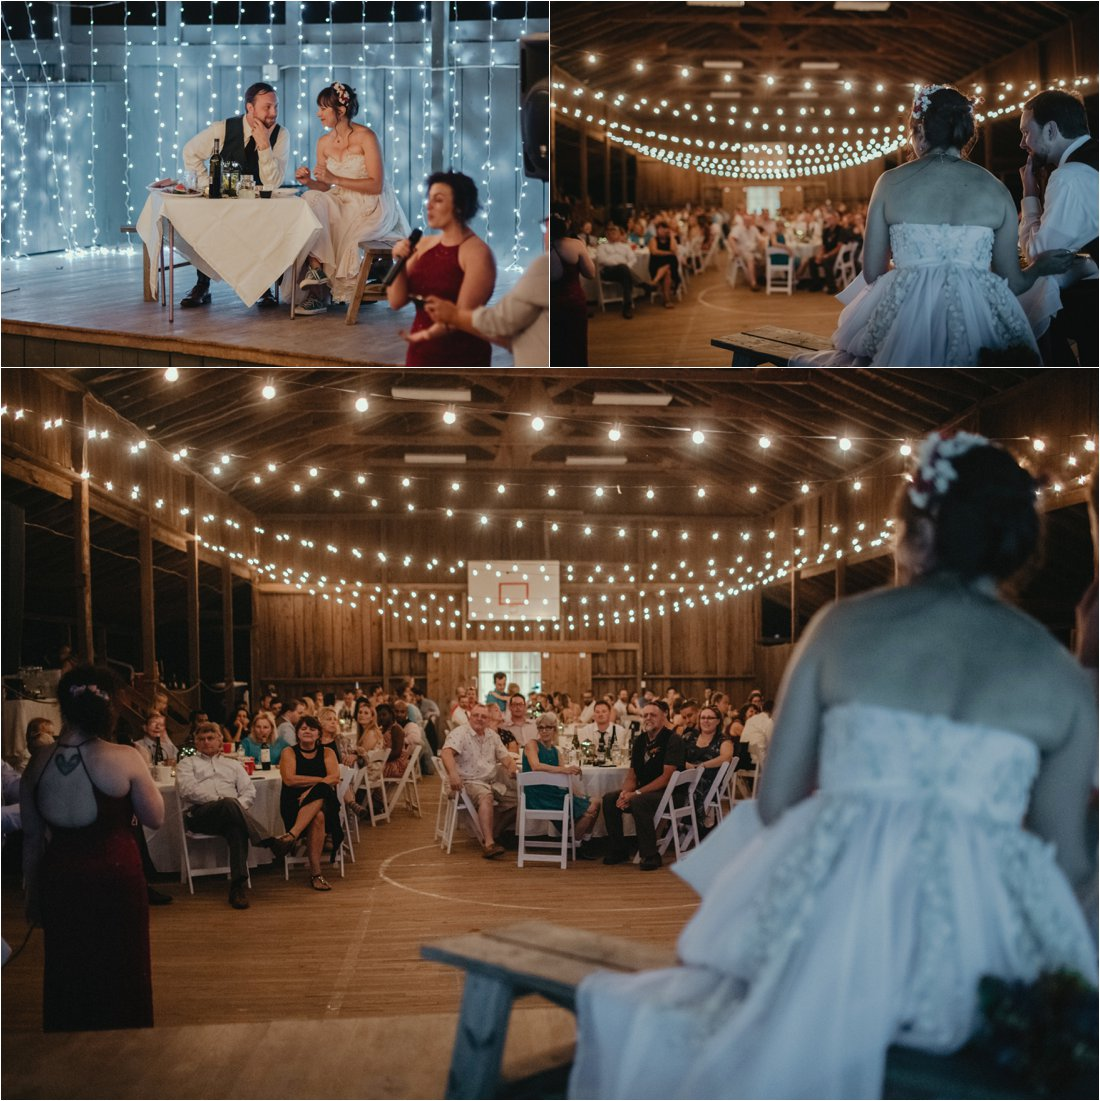 echo-oscar-camp-pinnacle-asheville-hendersonville-nc-wedding_0040.jpg